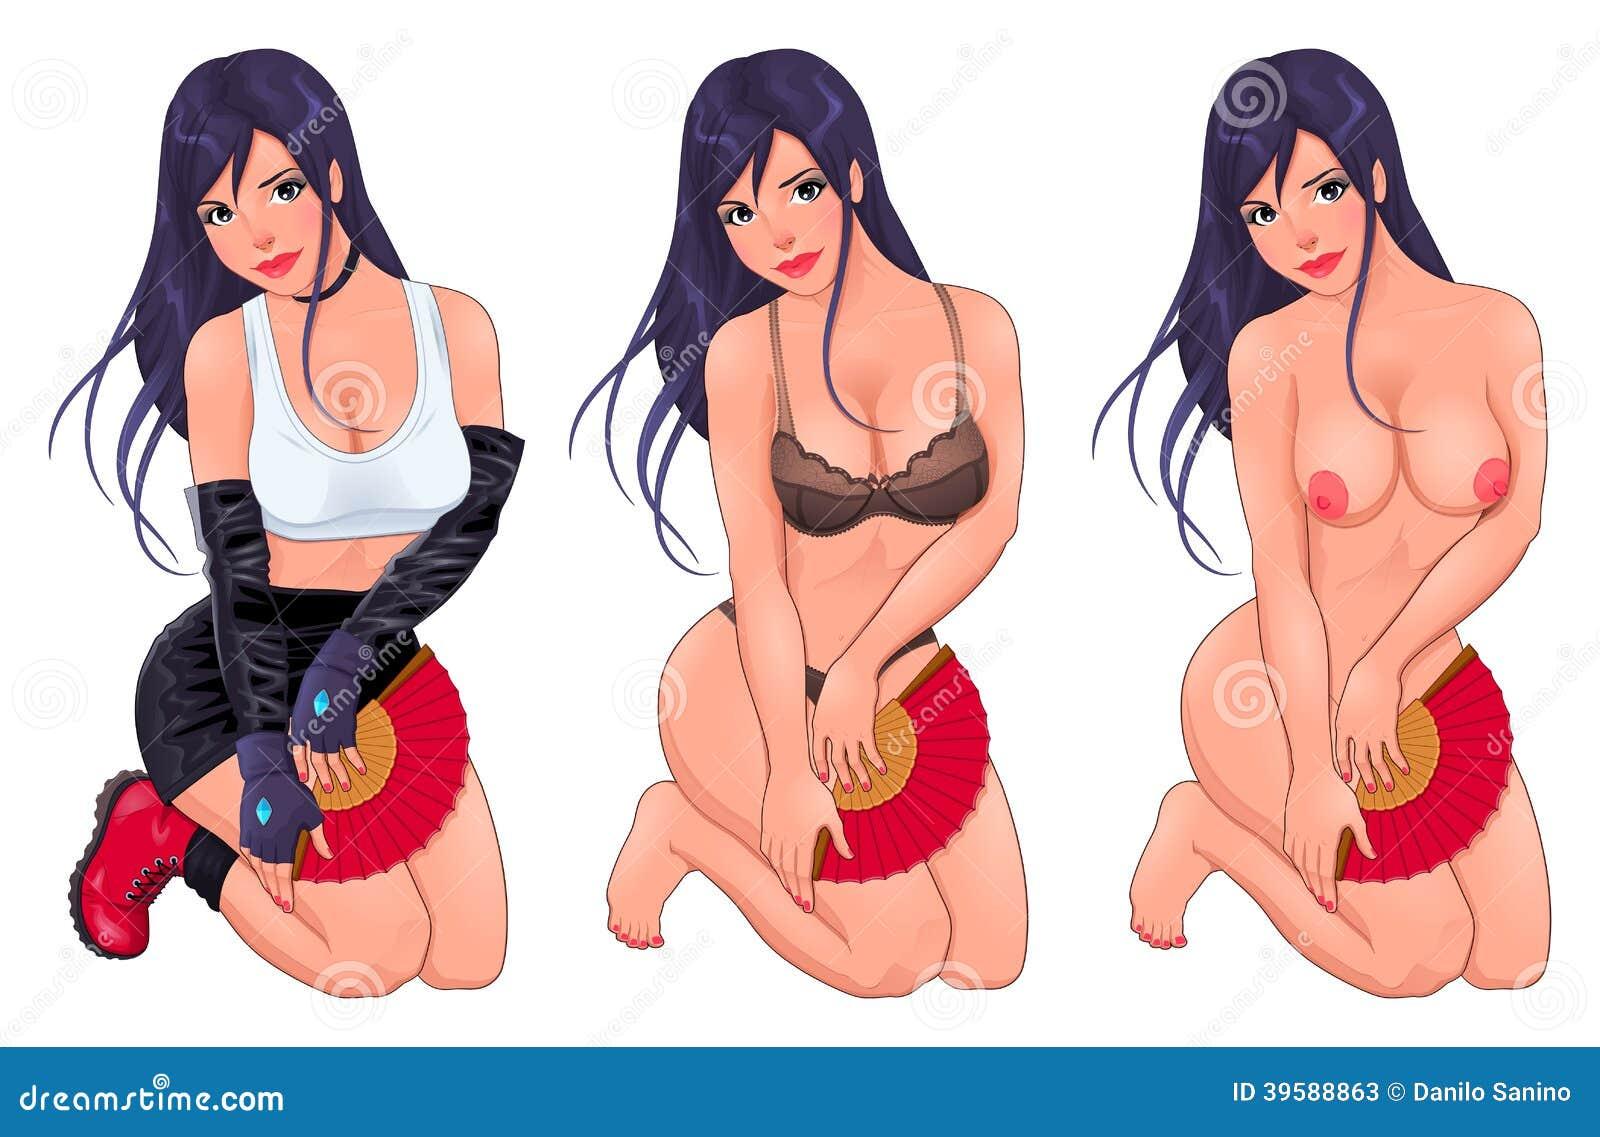 Riding sex gif asian